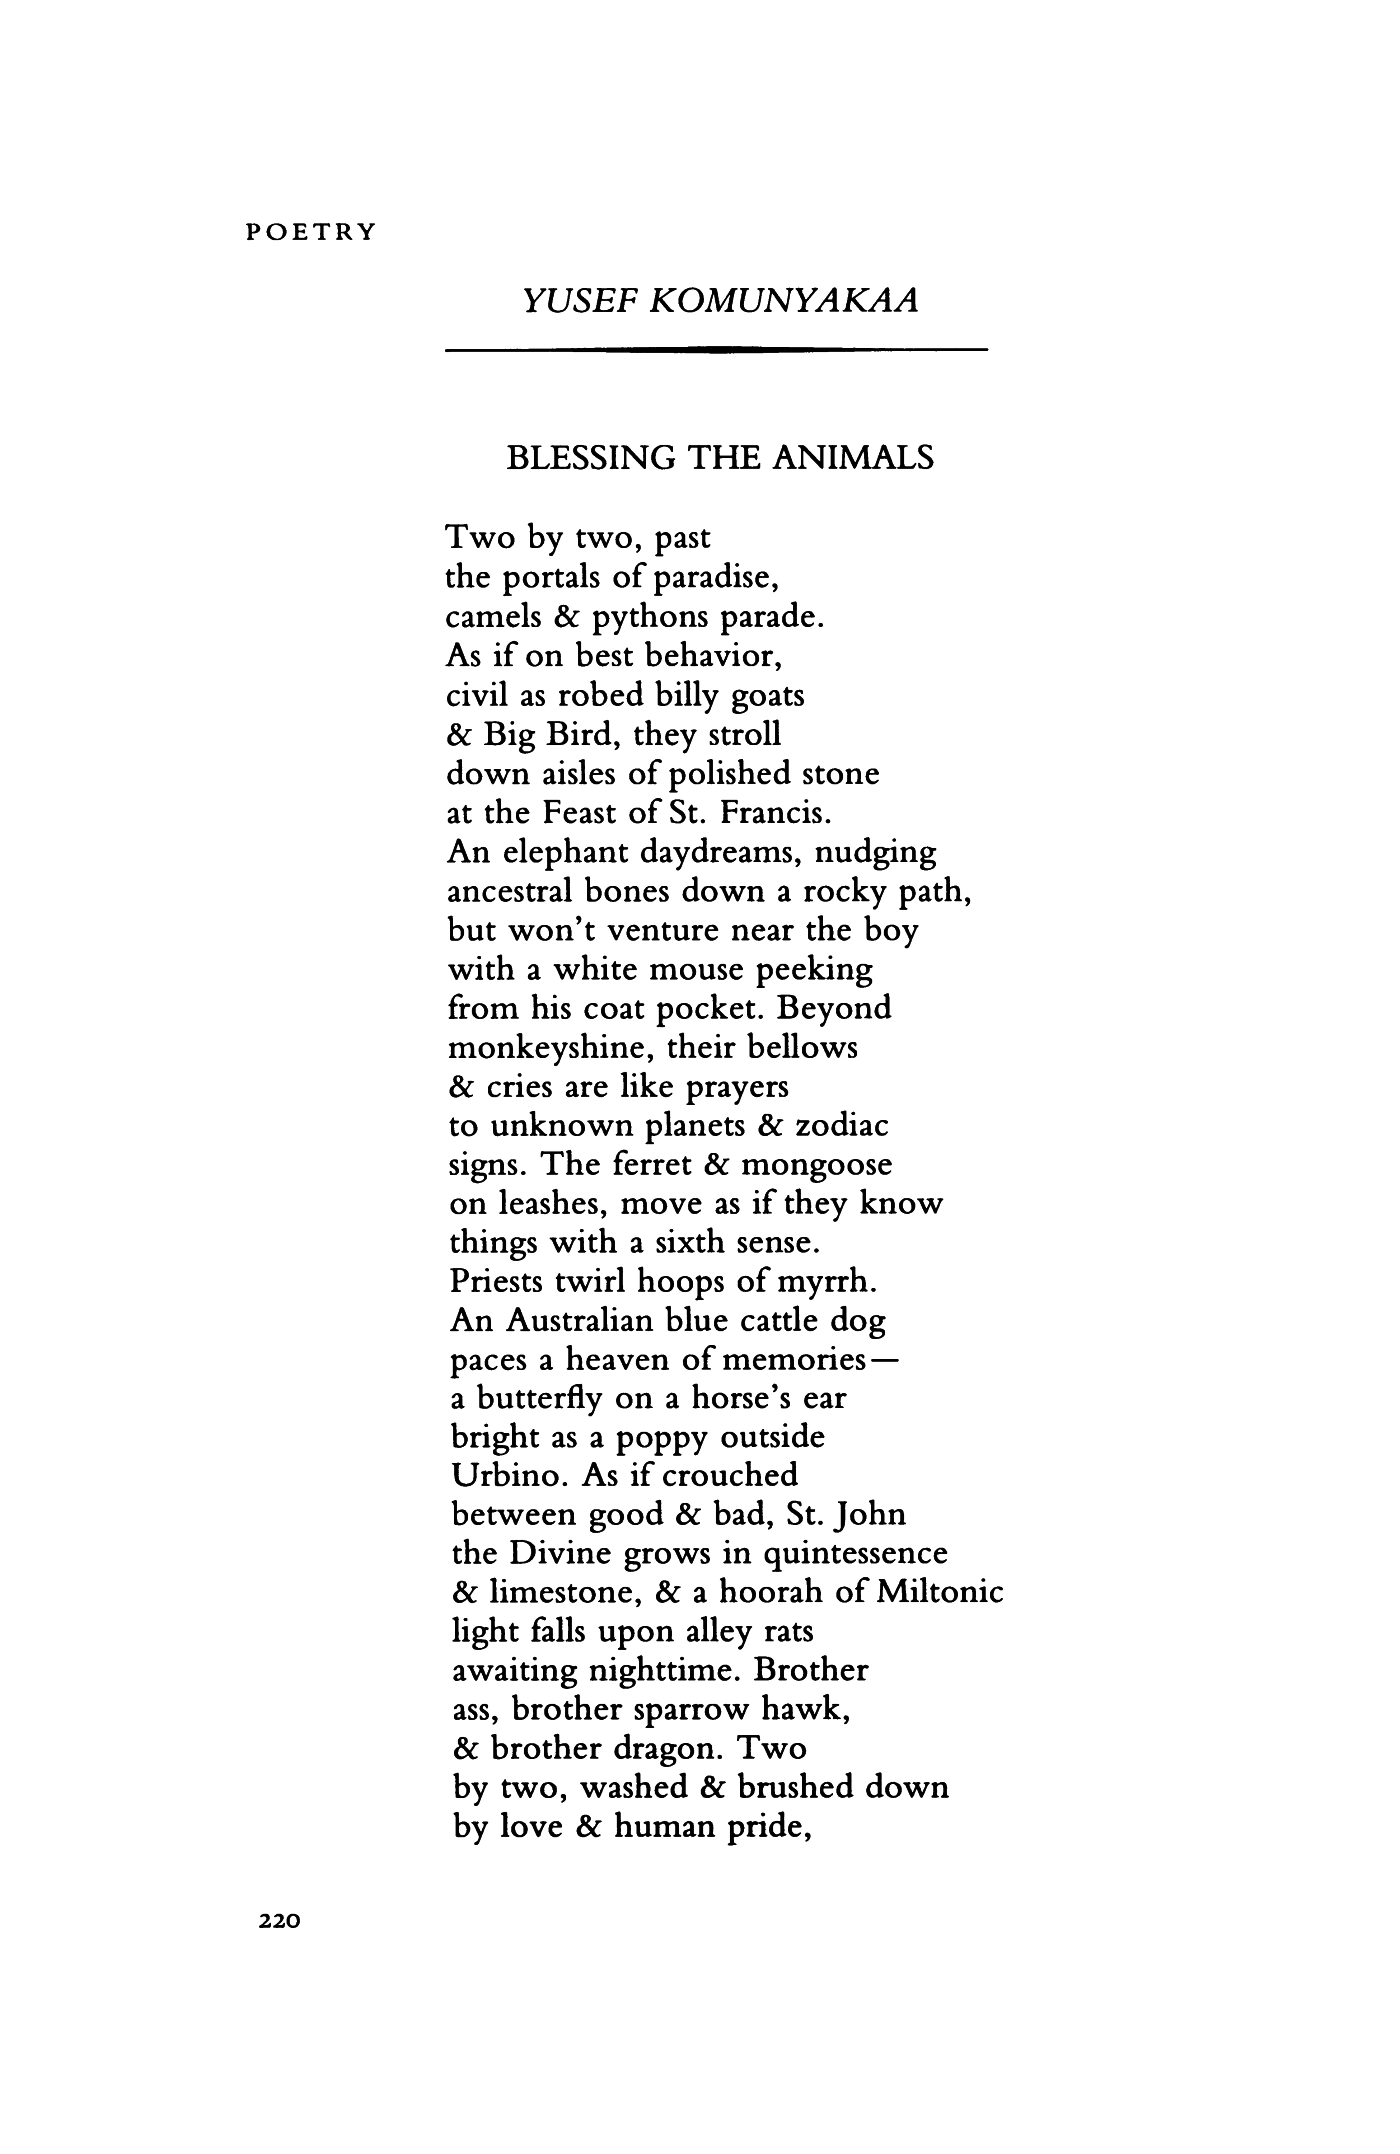 Blessing The Animals By Yusef Komunyakaa Poetry Magazine